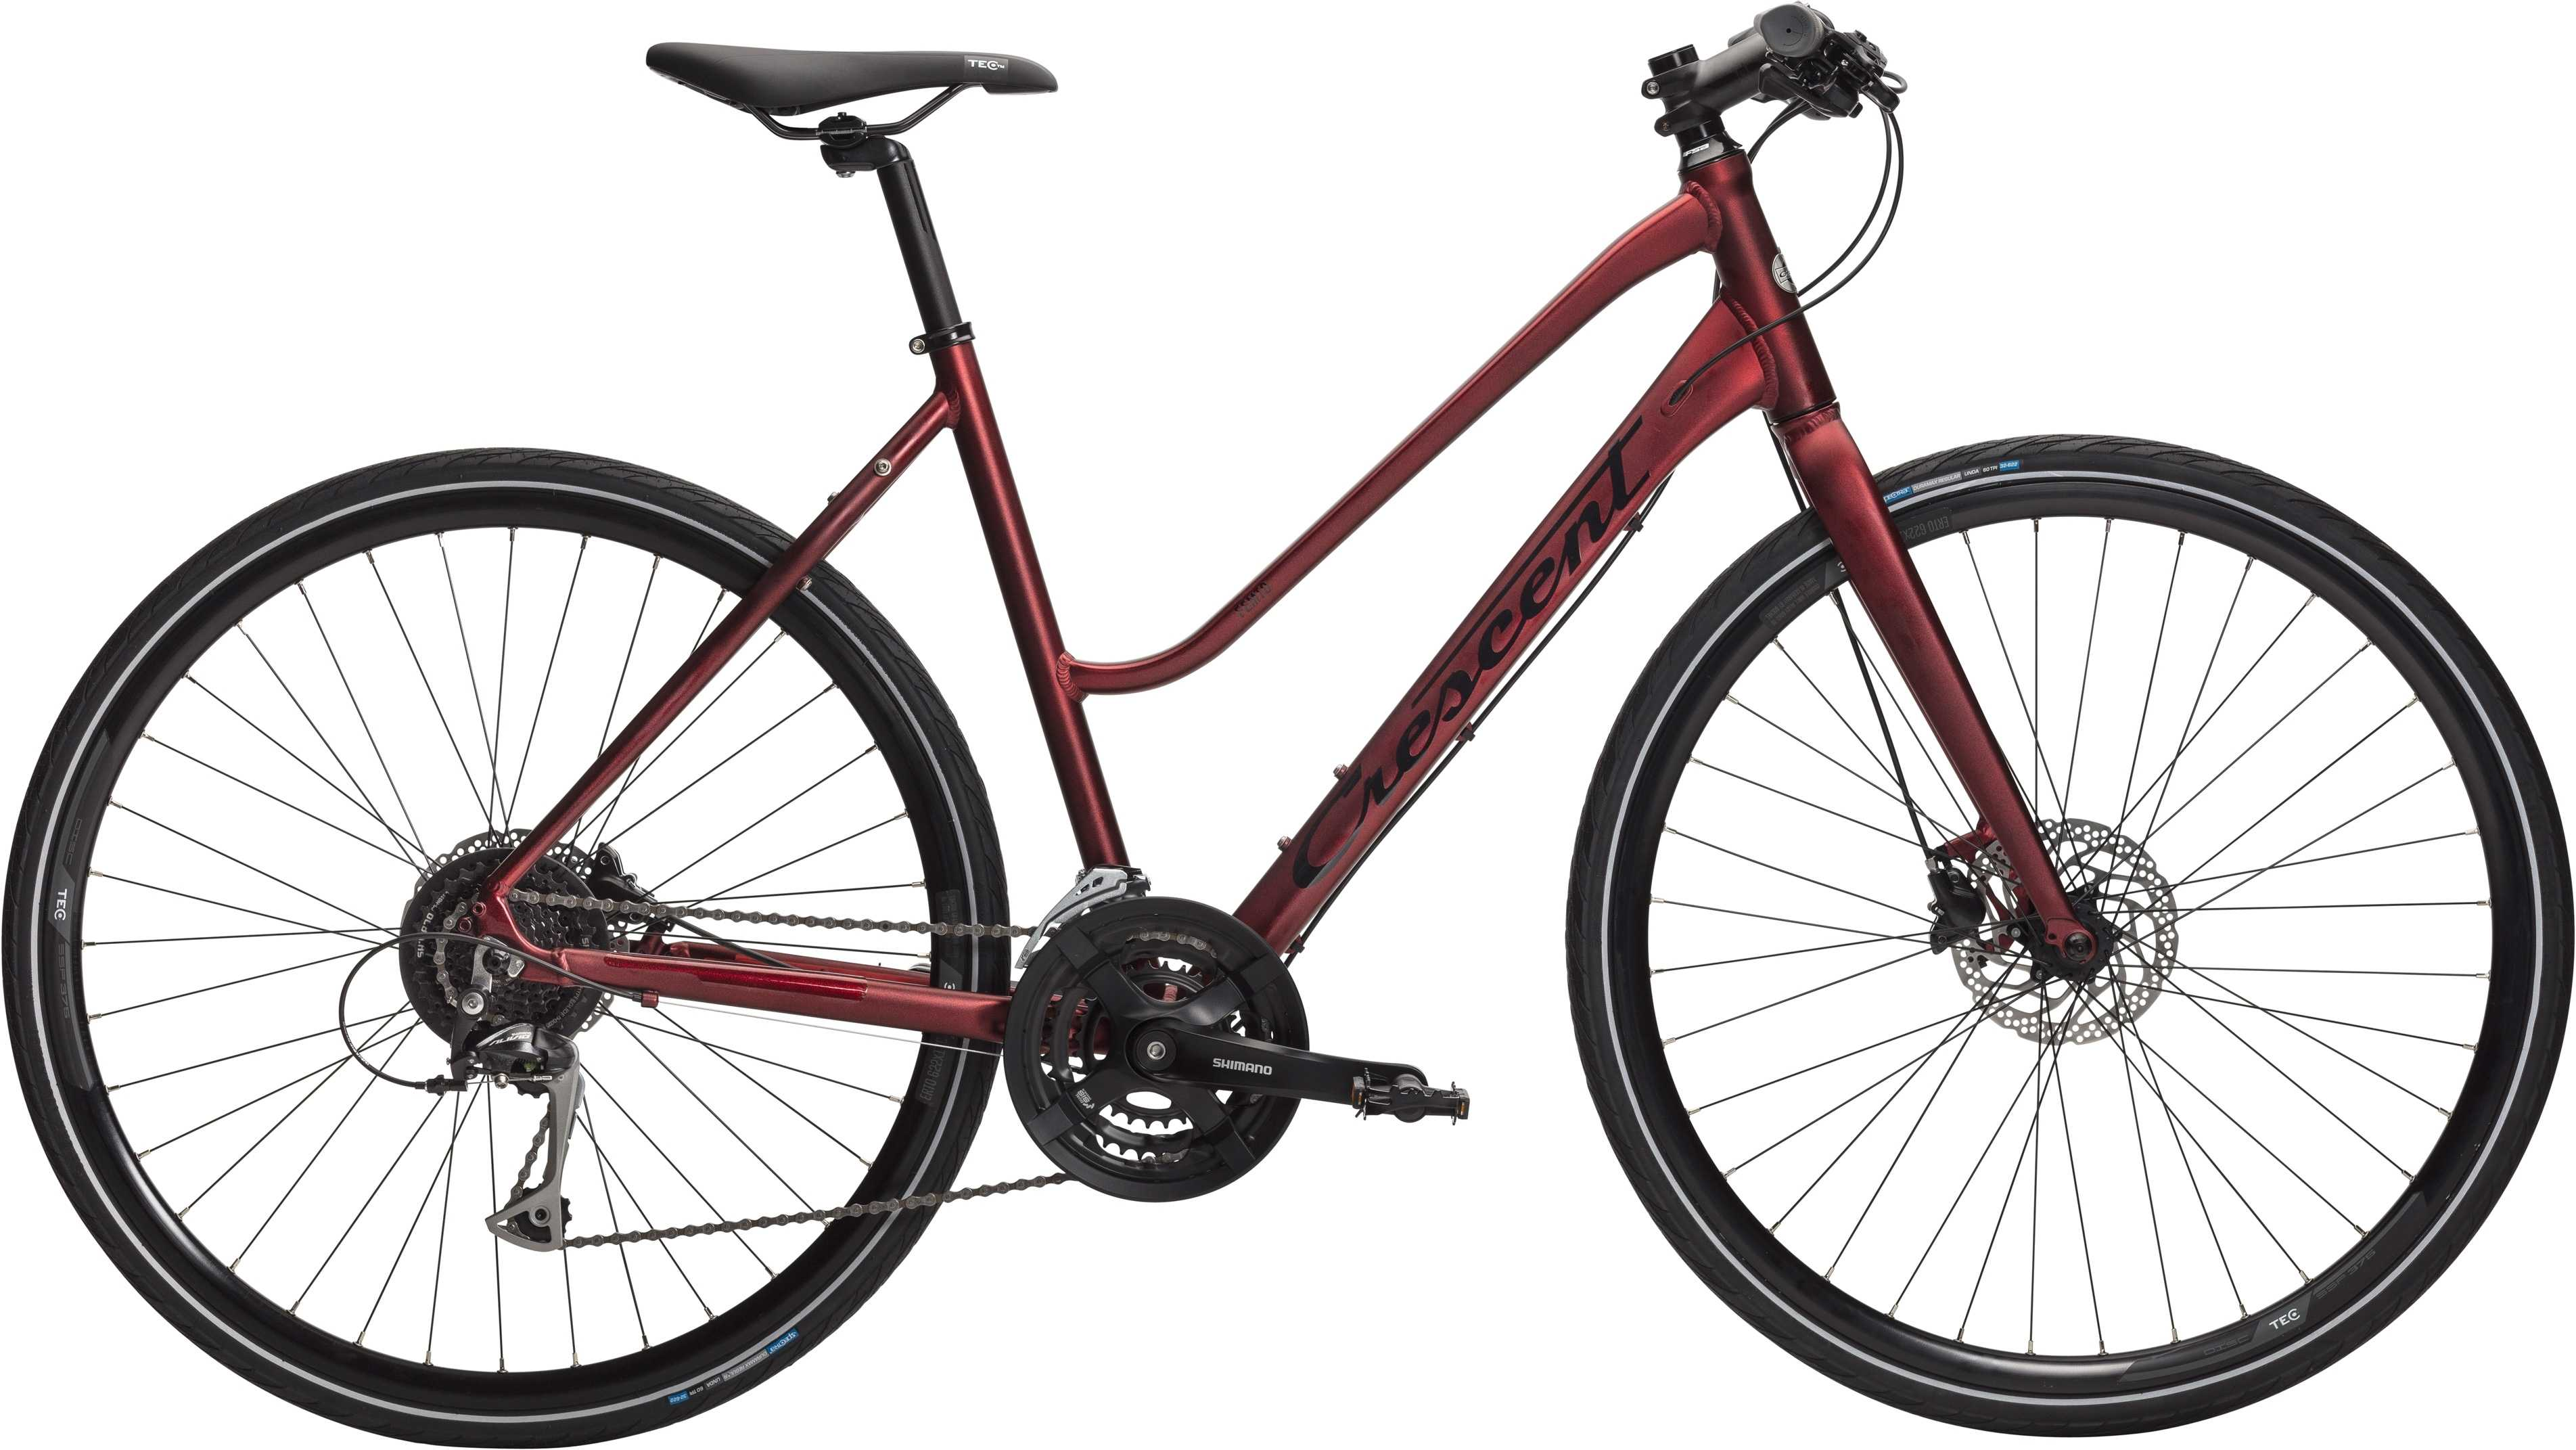 Crescent Femto matt röd metallic 51 cm